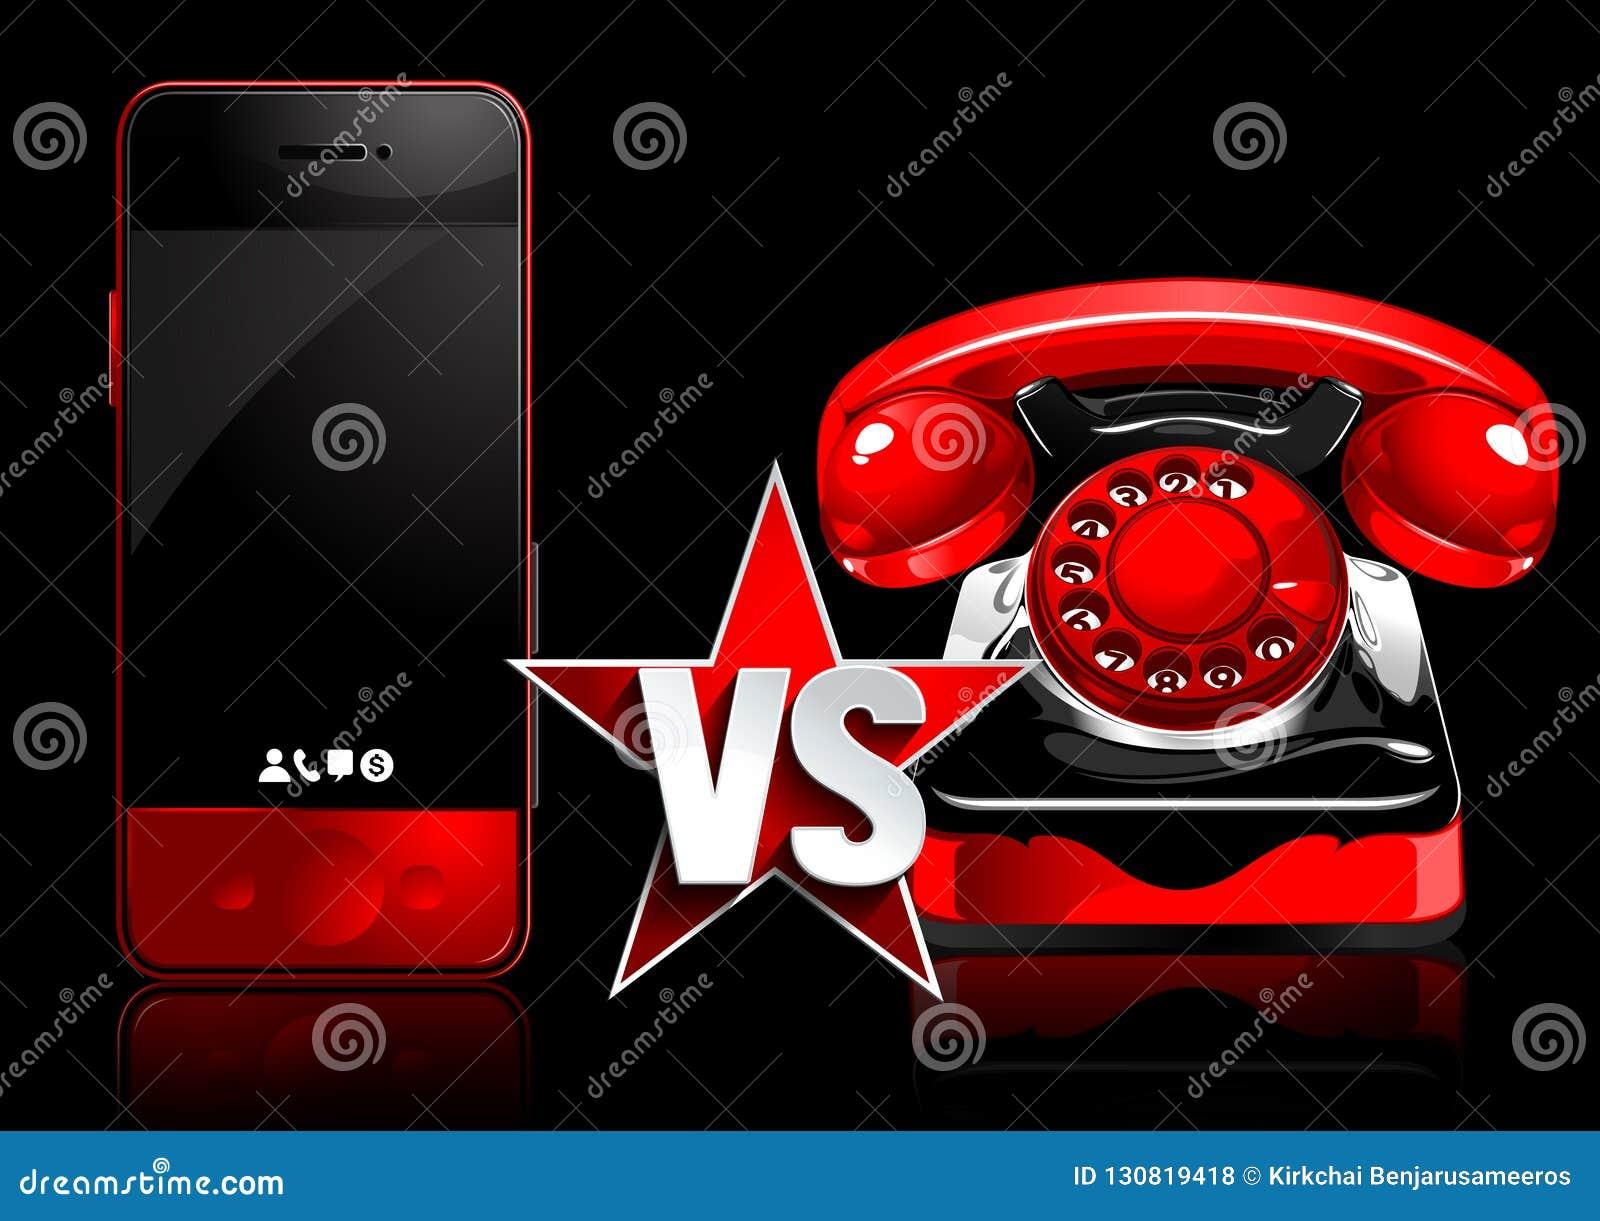 Mobiltelefon vs den retro telefonen